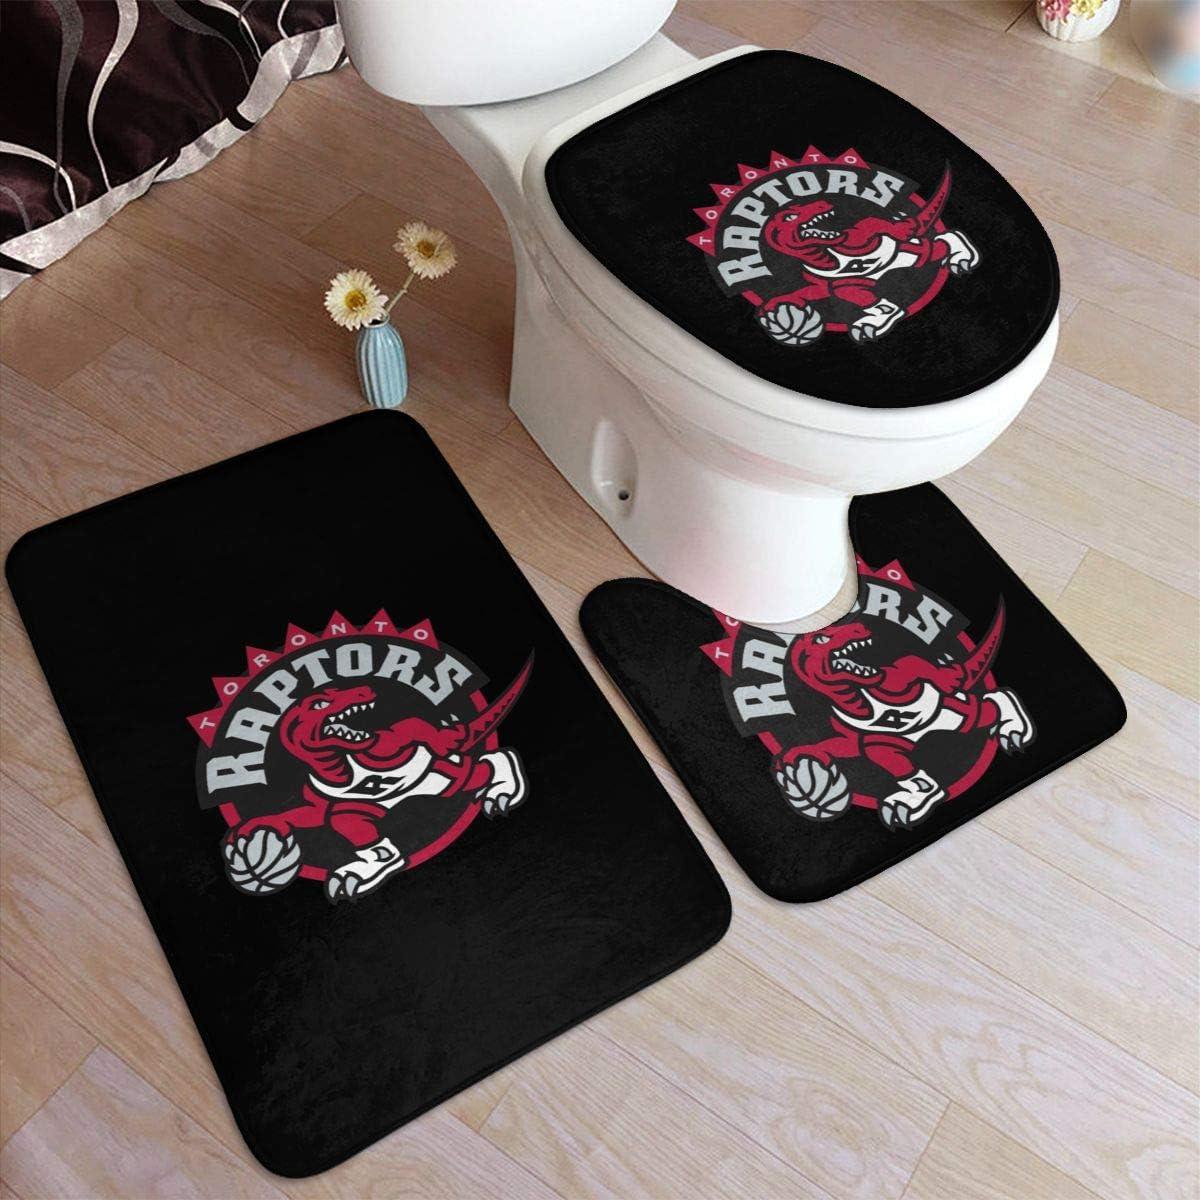 Toronto Logo Raptors Bathroom U-Shaped Contour Mat//Floor Mat//Toilet Cover Bathroom Carpet Cover,3 Piece Non-Slip Soft Absorbs Moisture